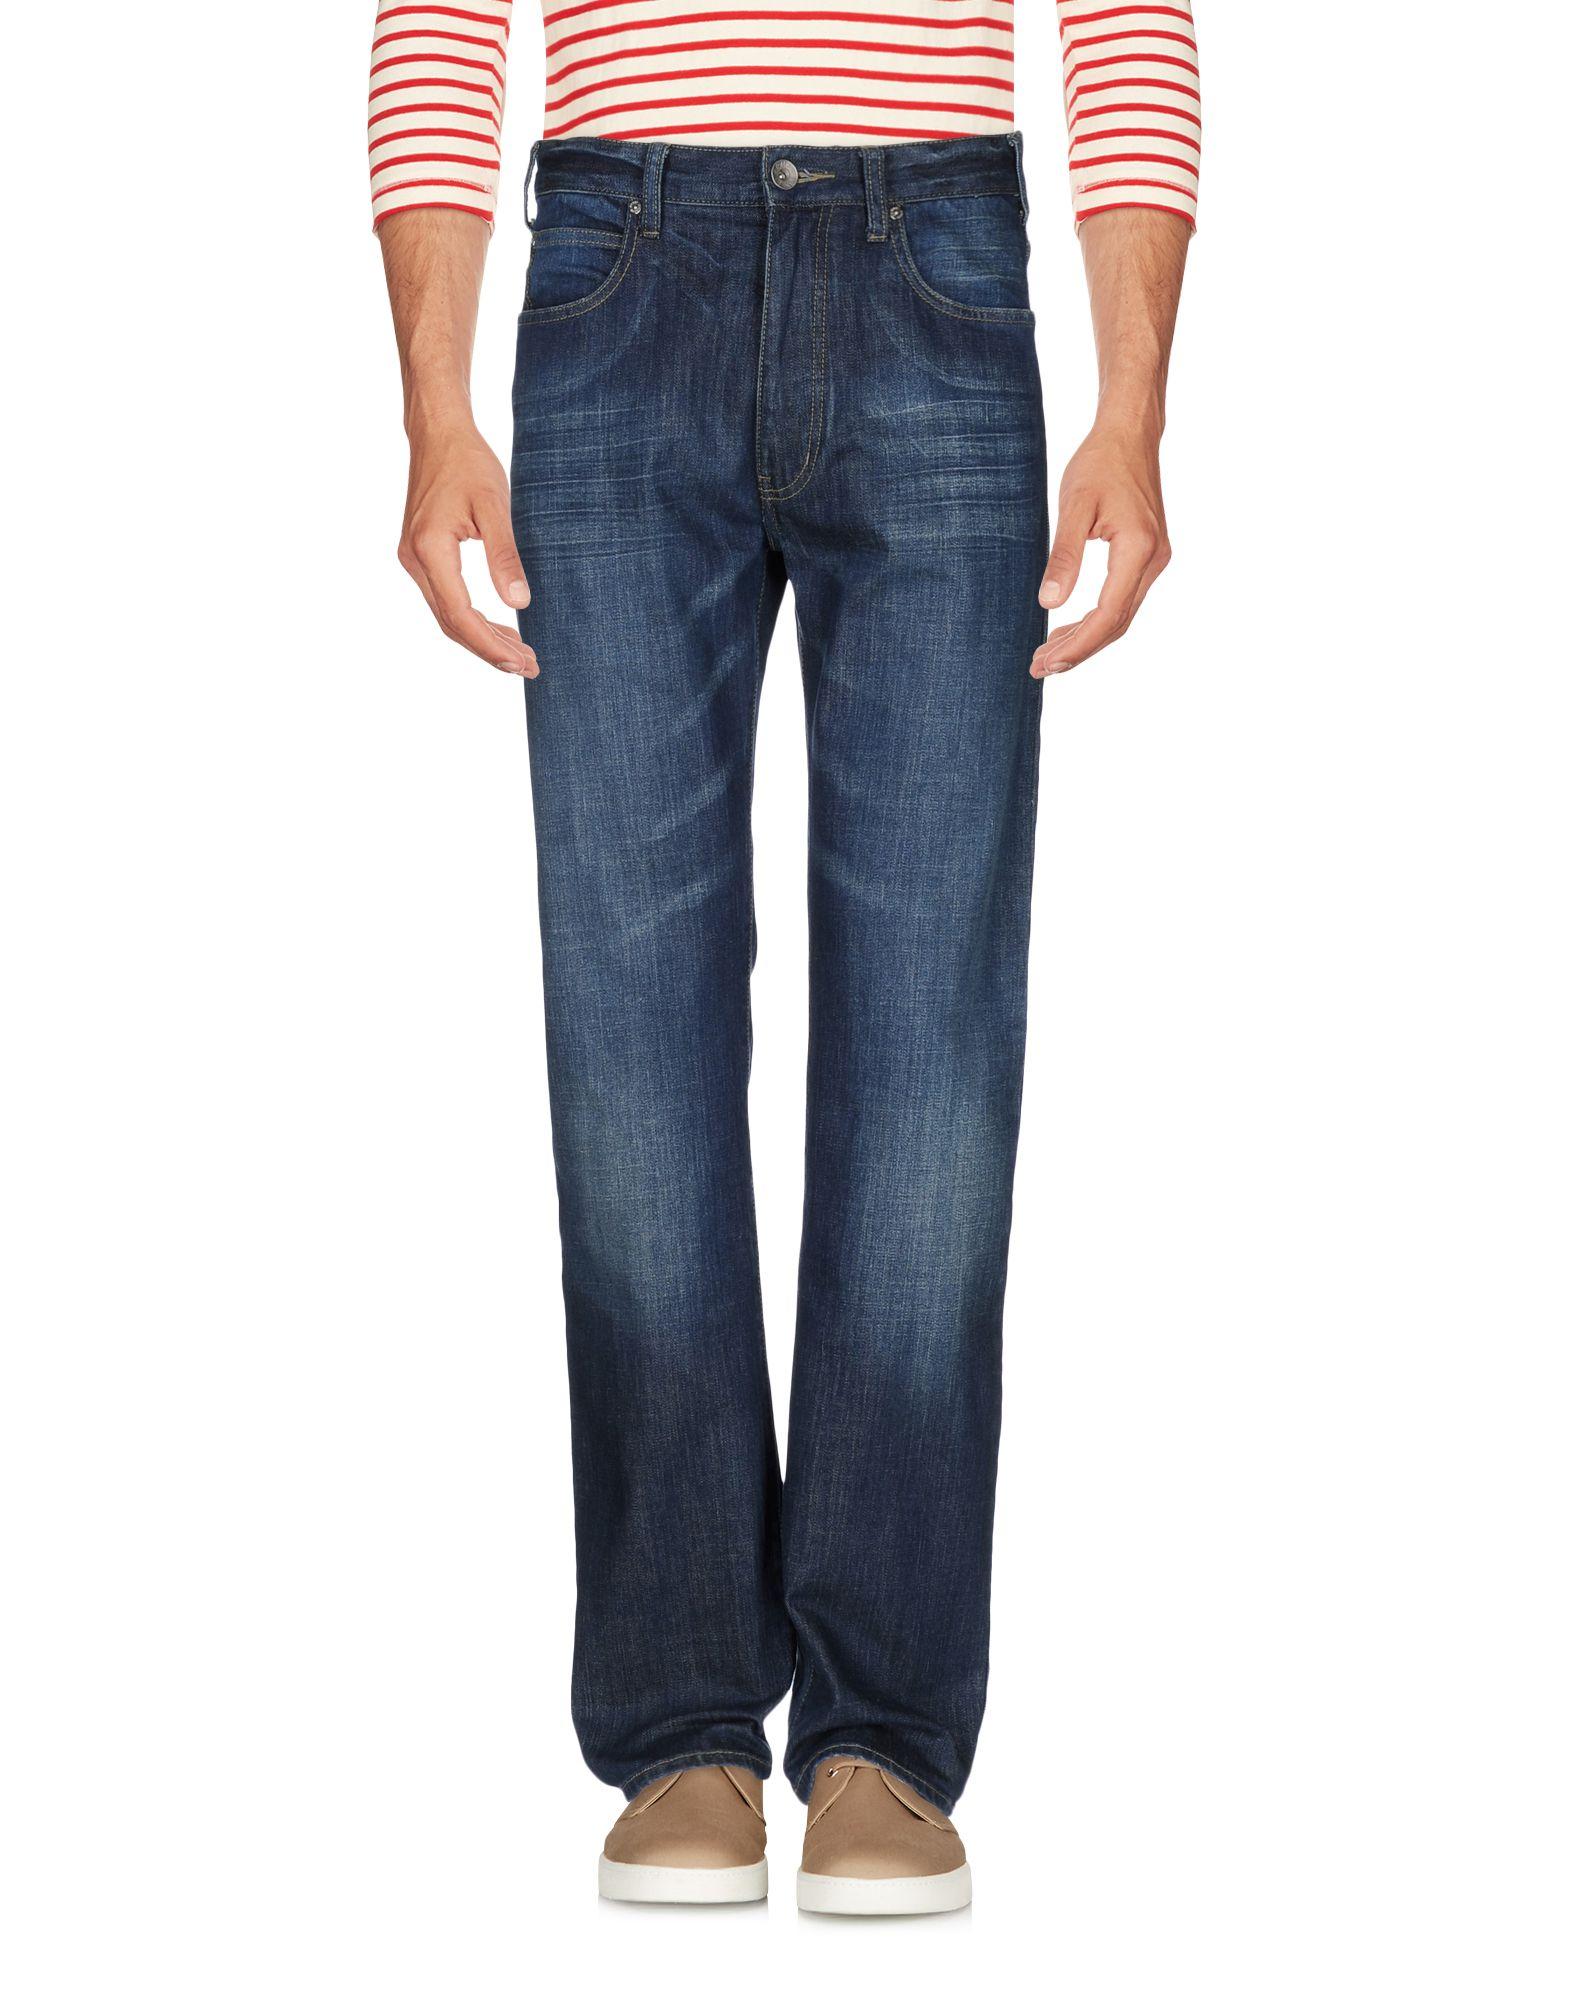 Pantaloni Pantaloni Pantaloni Jeans Armani Jeans uomo - 42582629SL 571